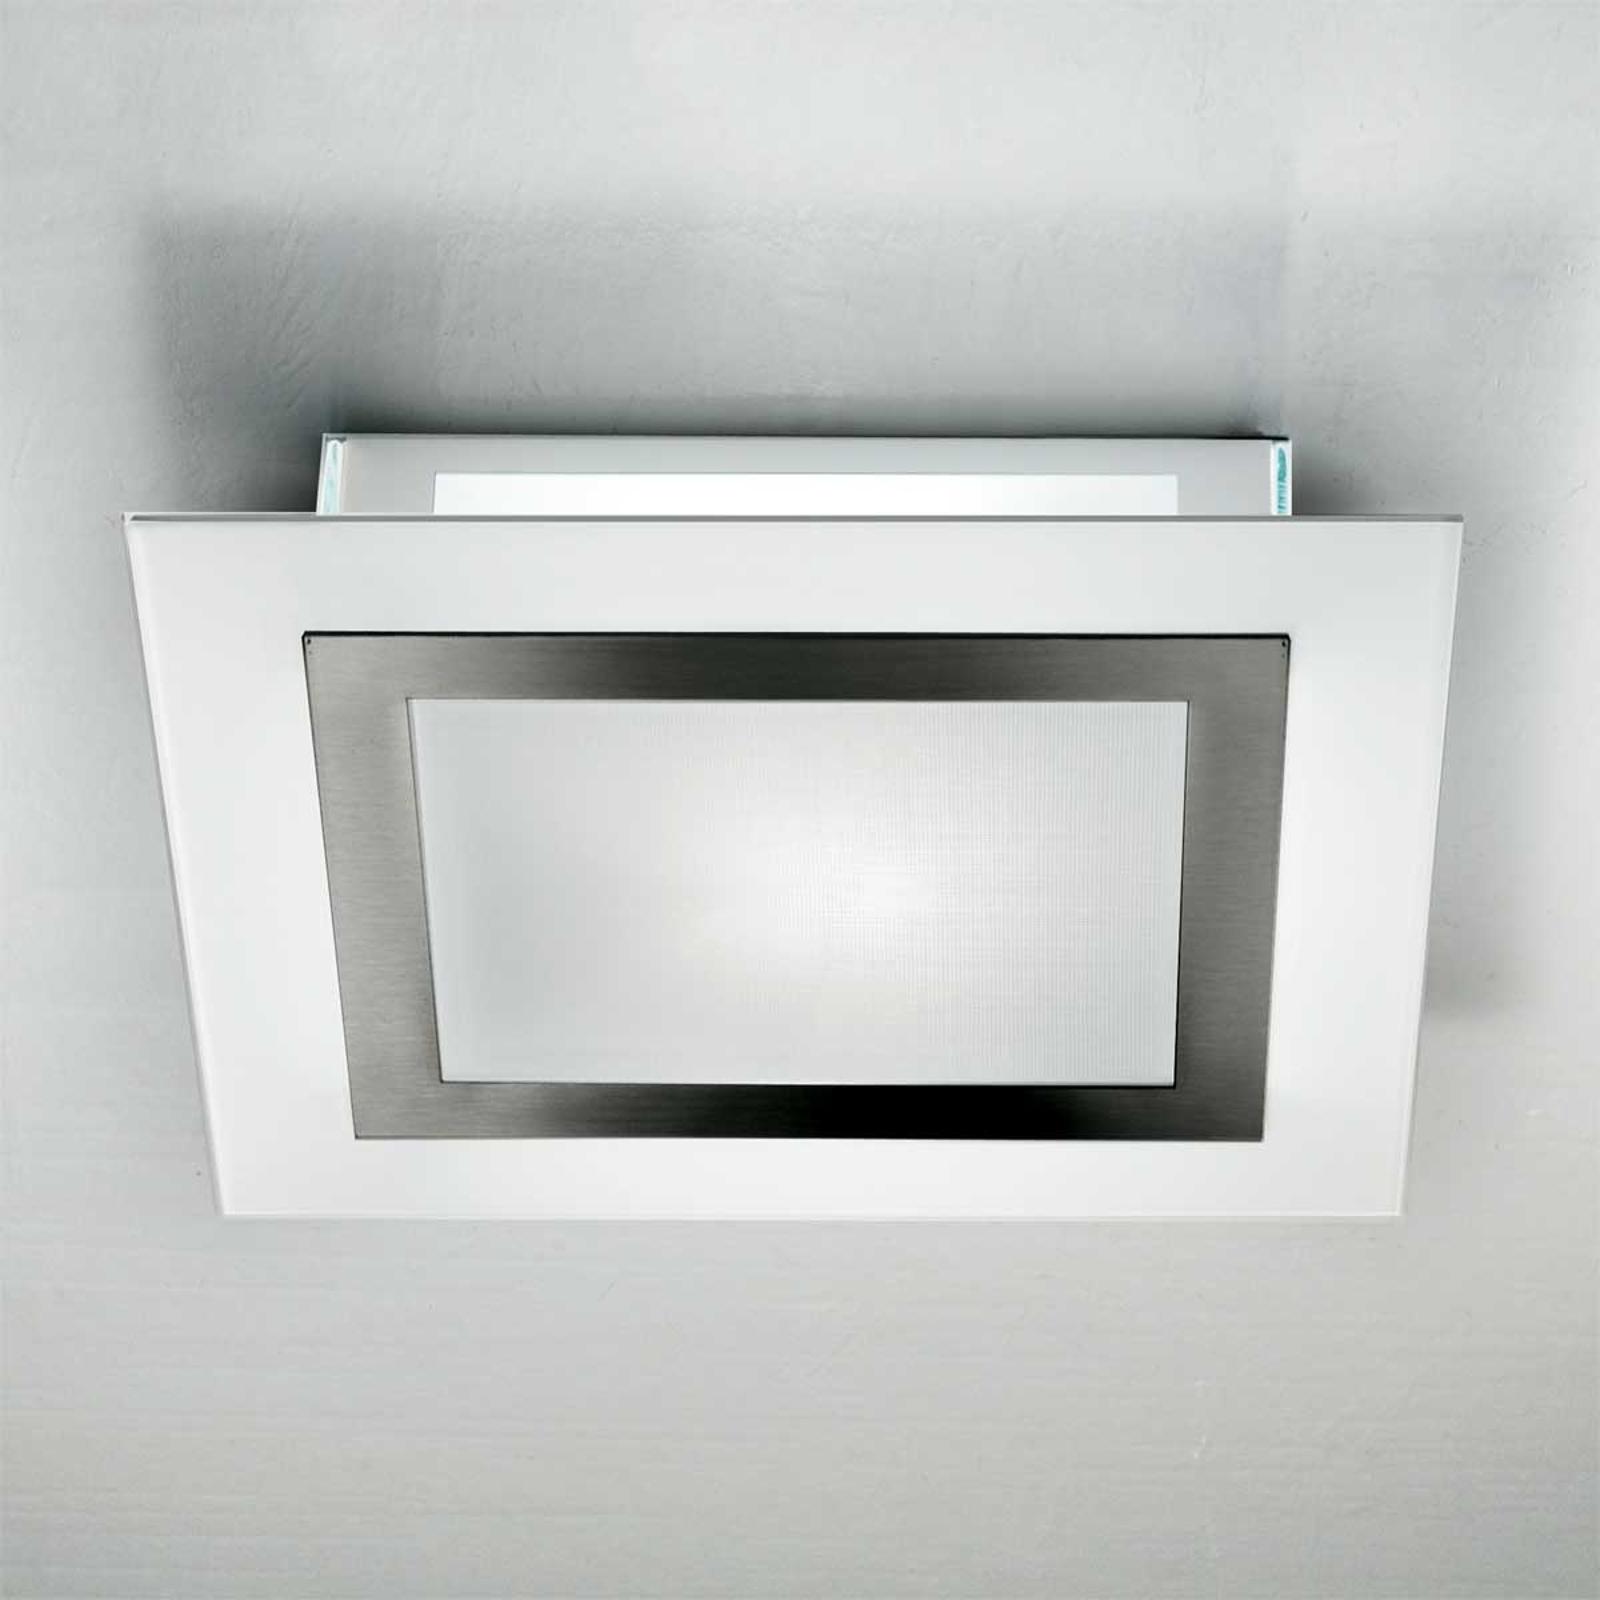 Stijlvolle plafondlamp FRAME 8155, E27, 40 cm